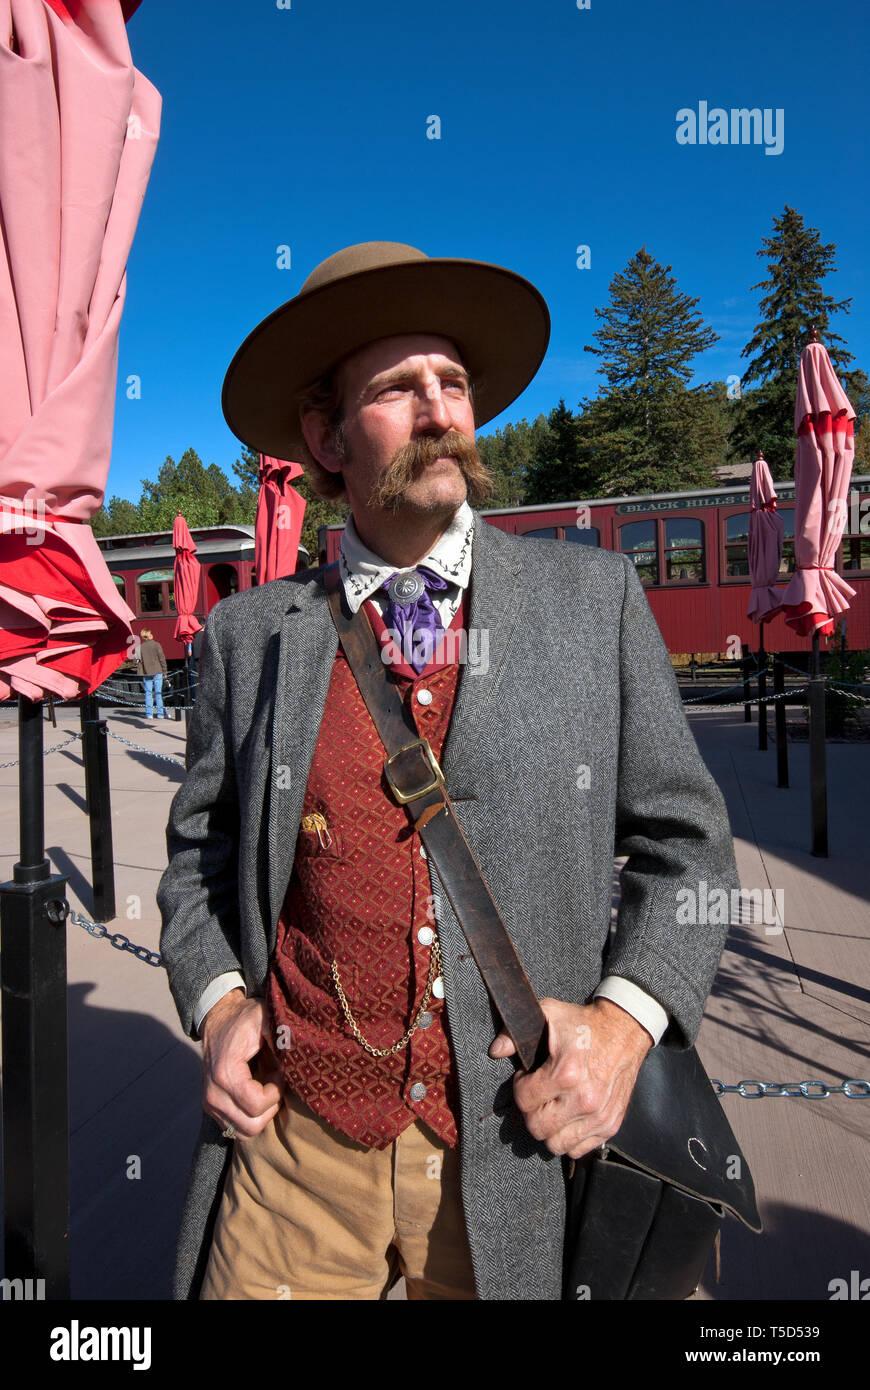 Actor reenacting the famous gambler and gunman James Butler Hickok (known as Wild Bill Hickok), Hill City Station, South Dakota, USA - Stock Image